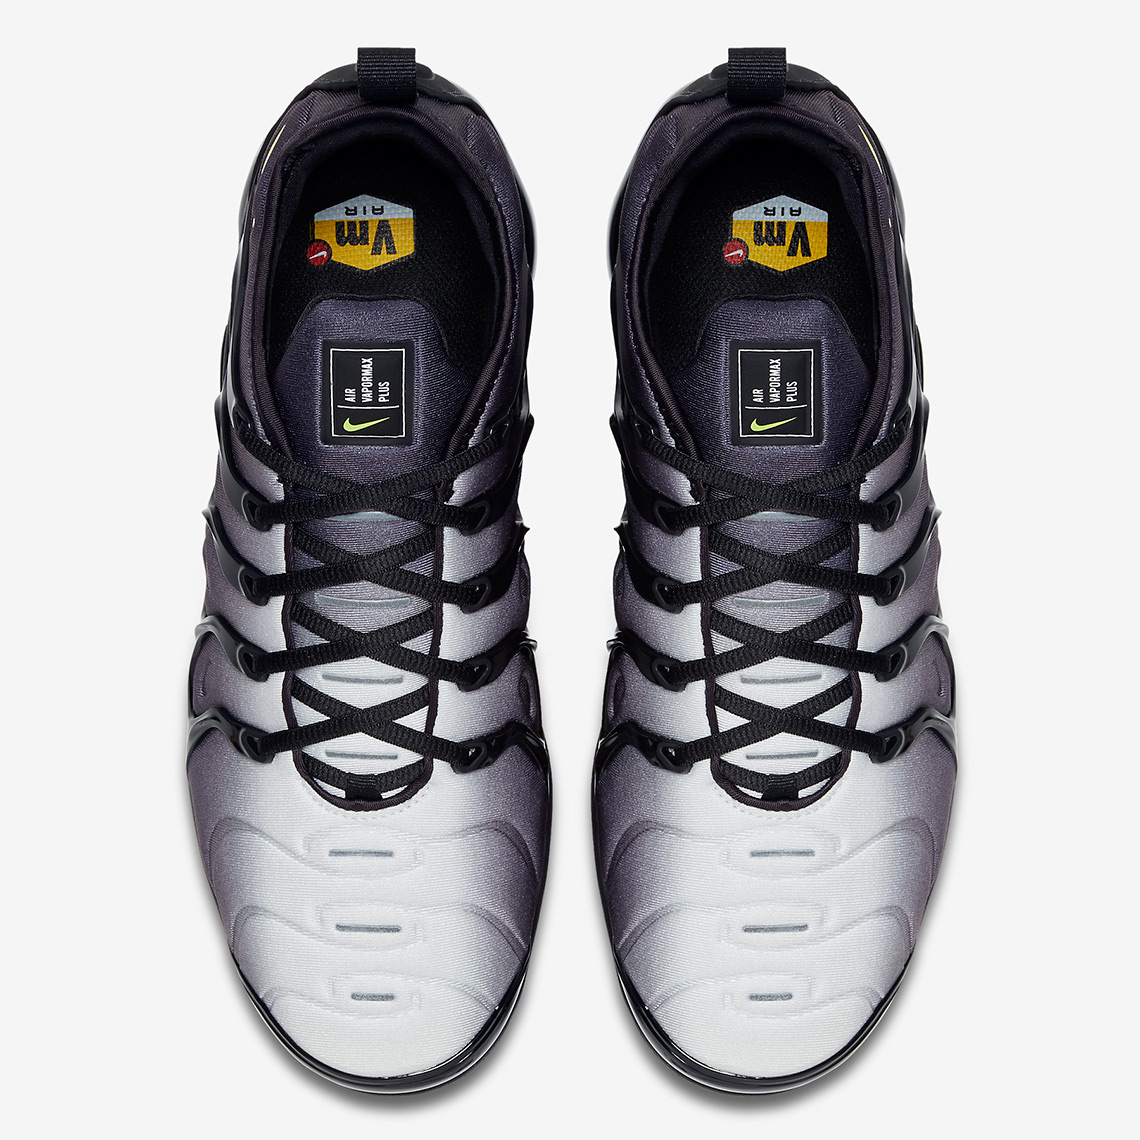 the latest 5f6aa b52f0 Nike VaporMax Plus Release Date April 6, 2018 190. Color BlackVolt-White